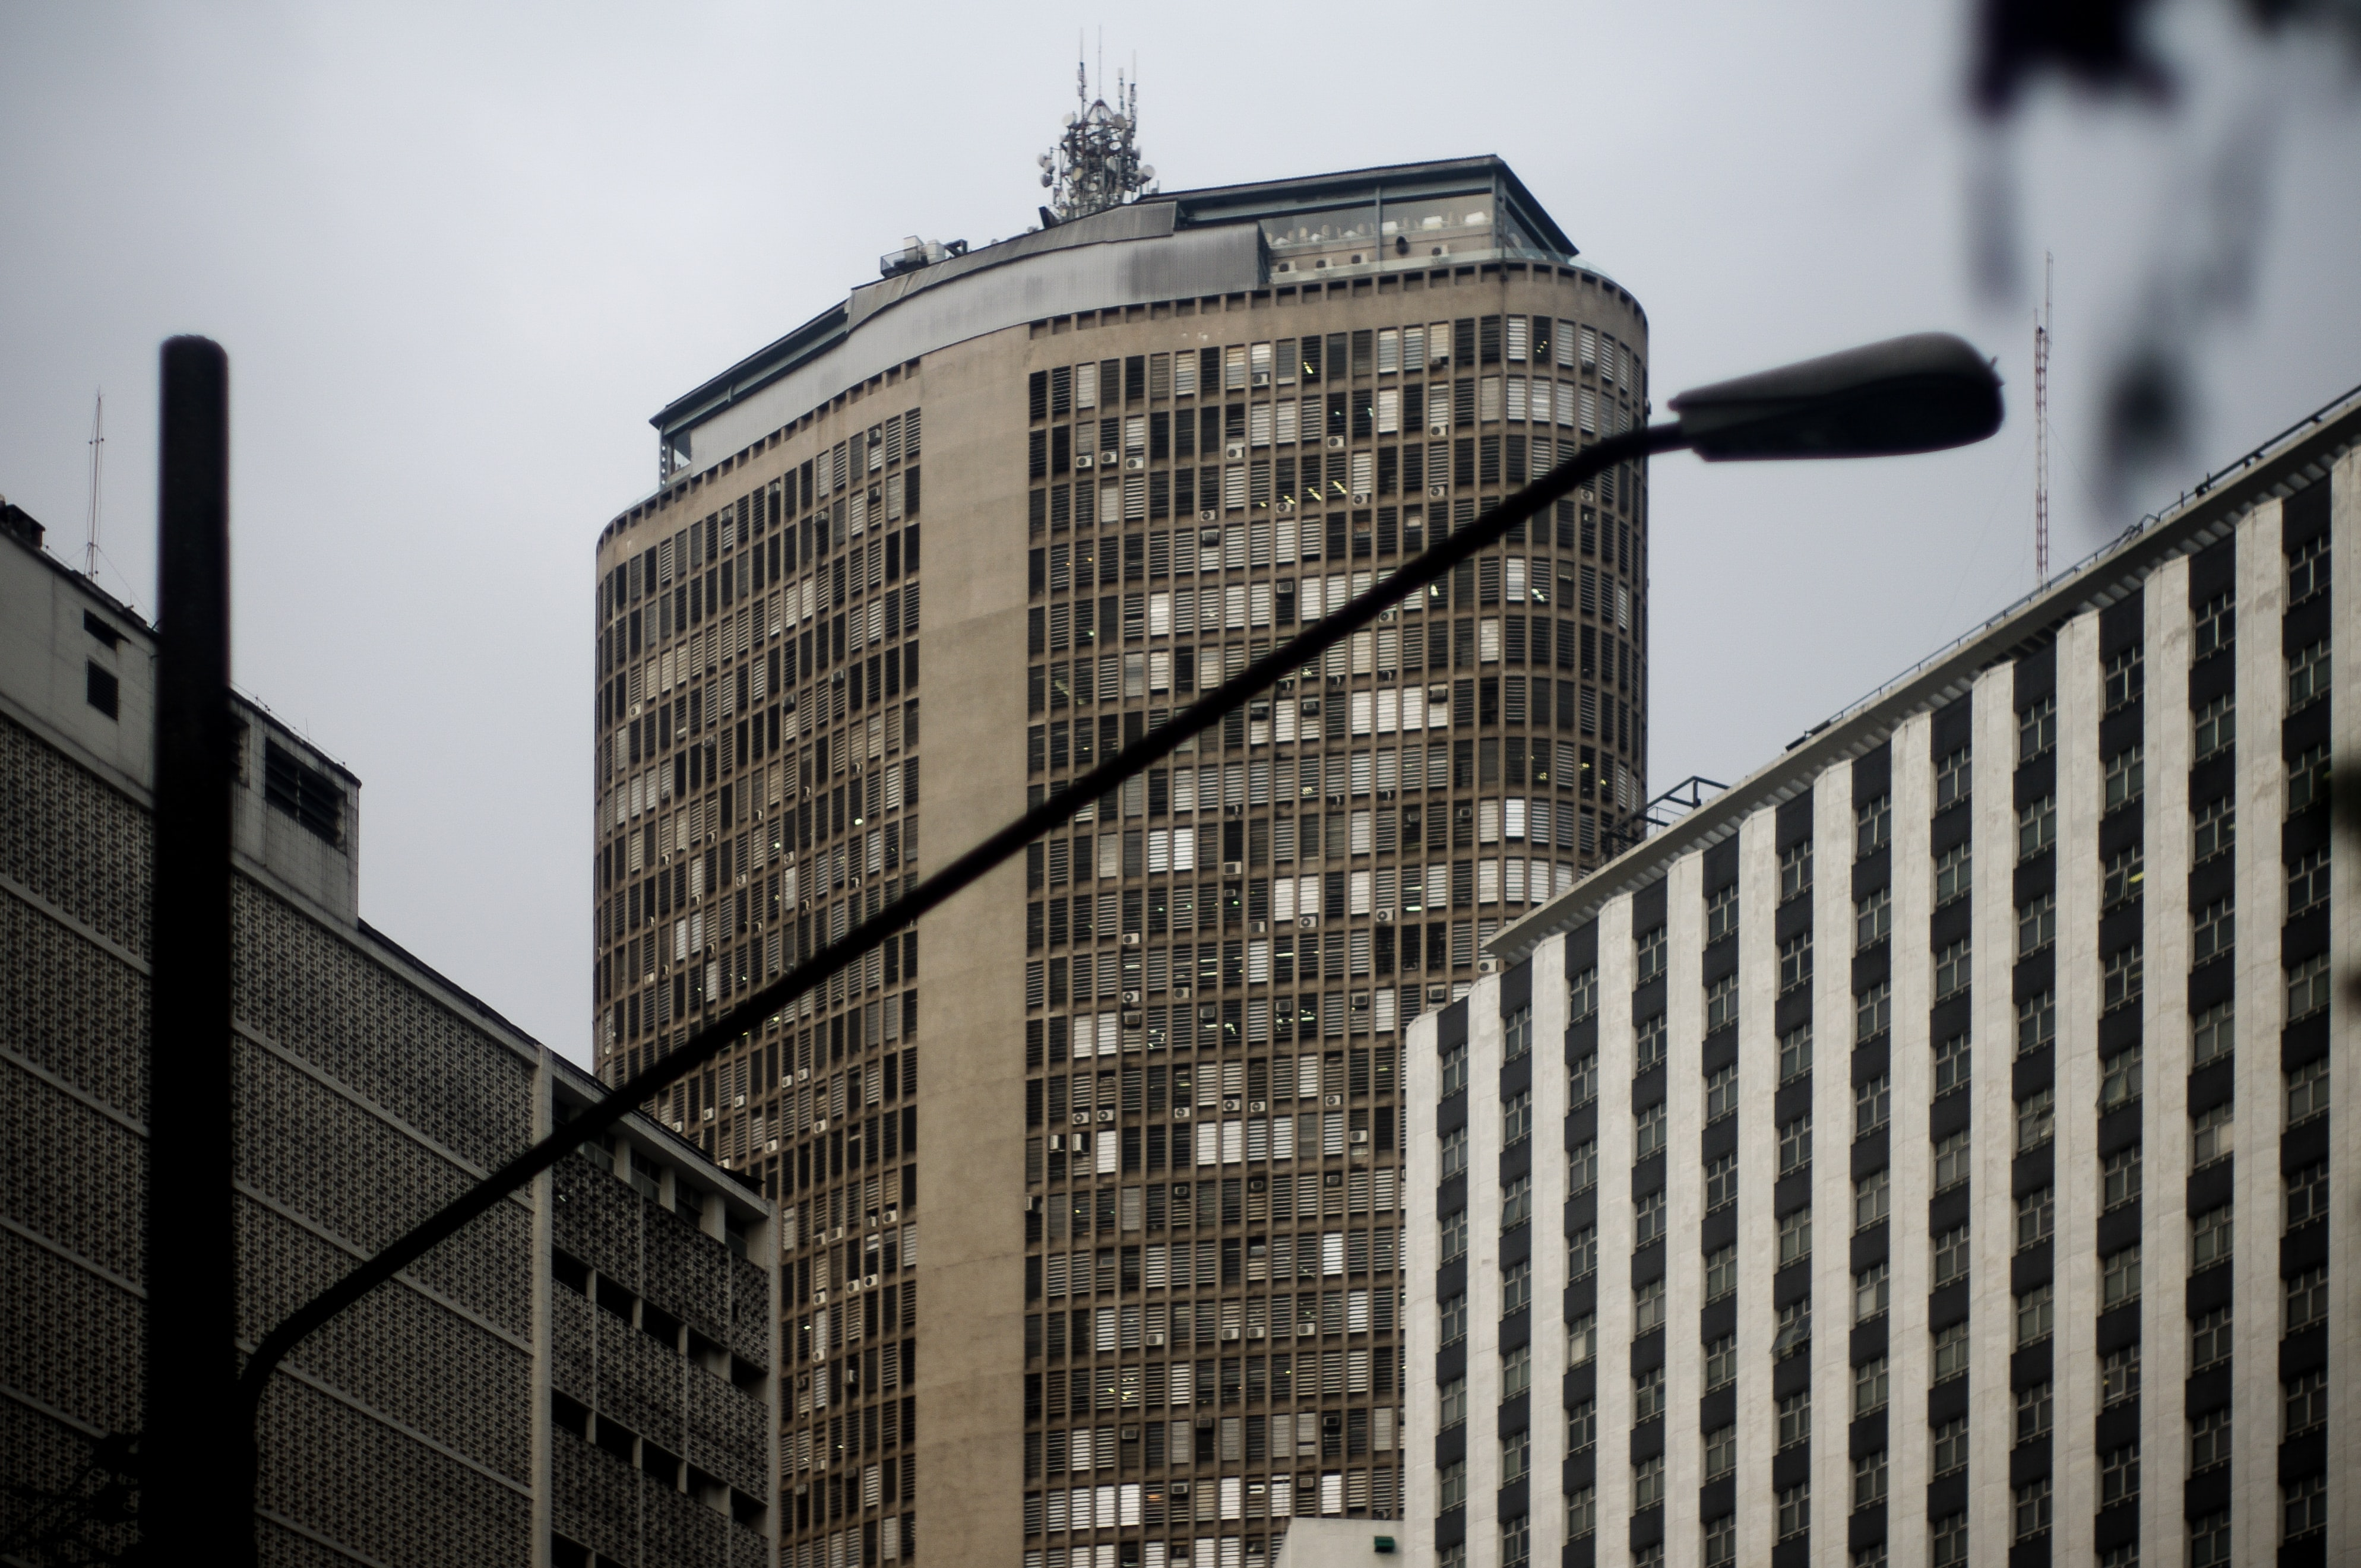 utility post near high rise building